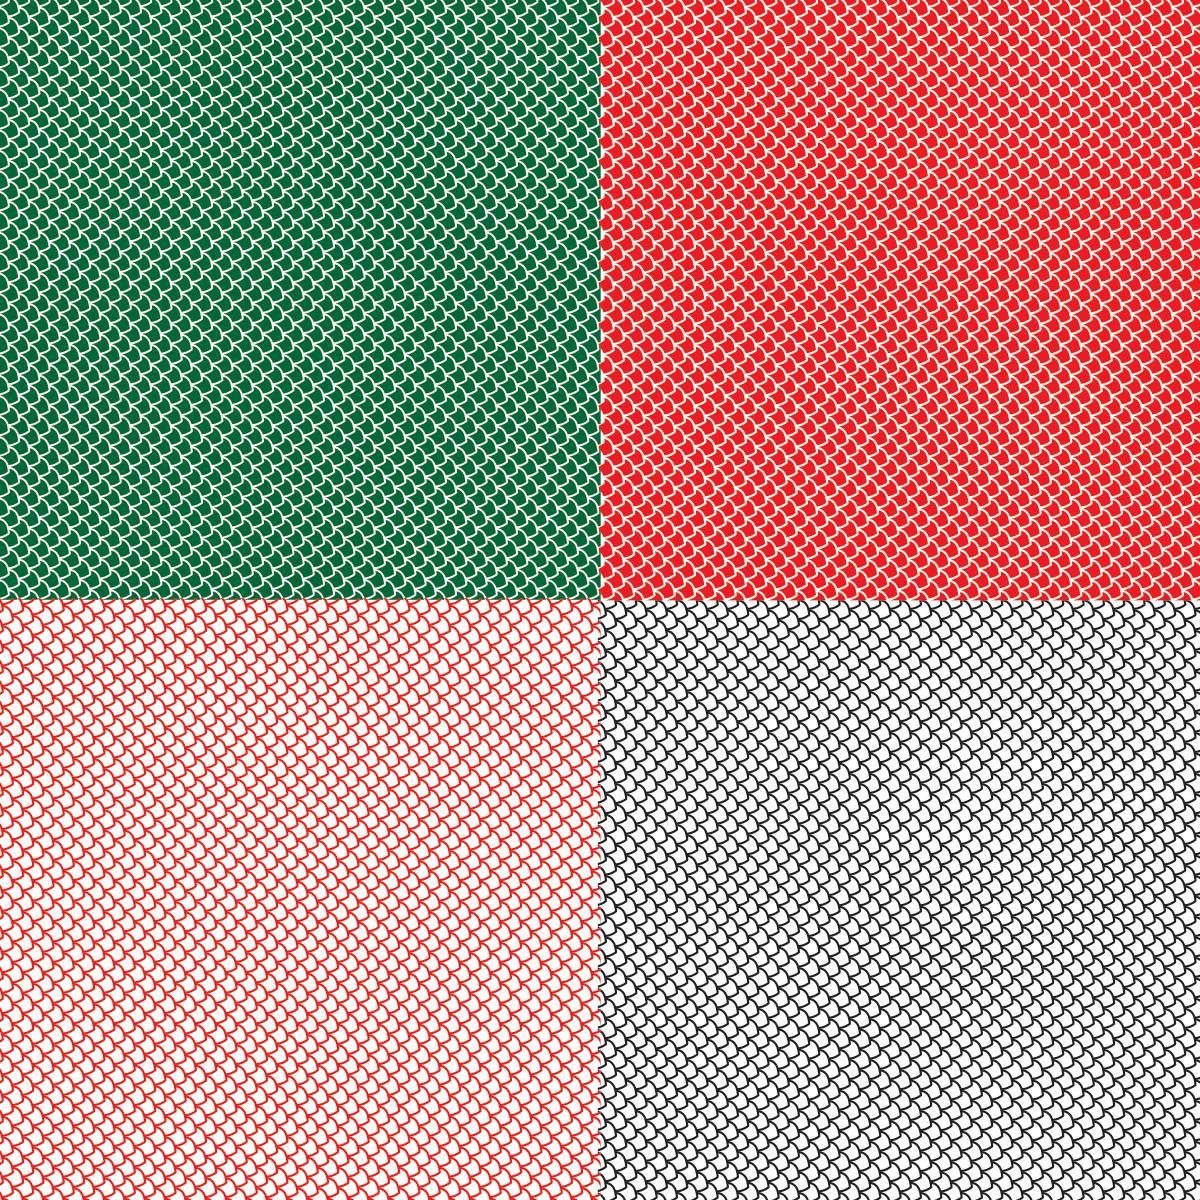 Pattern 18